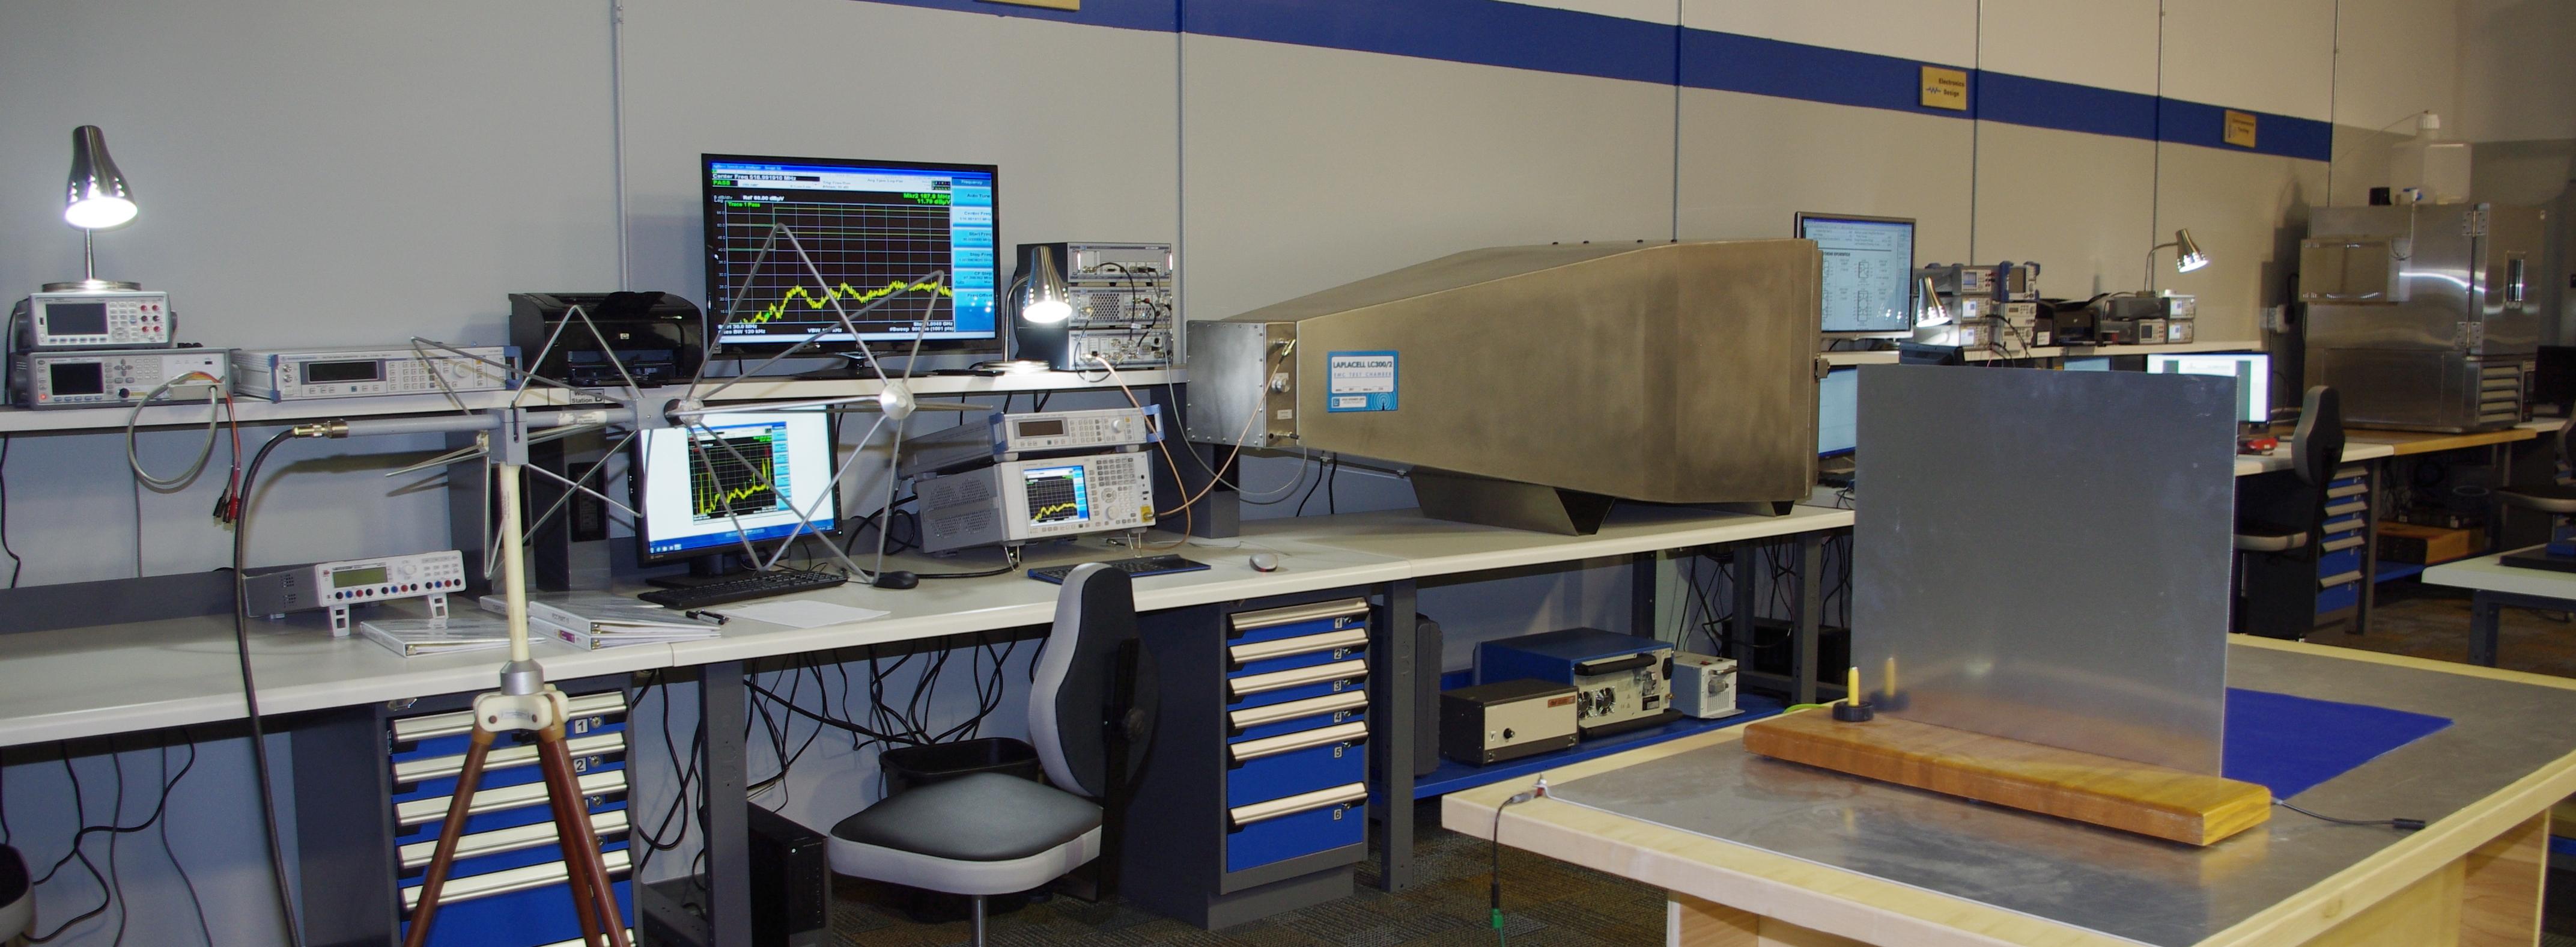 EMC/RF Testing